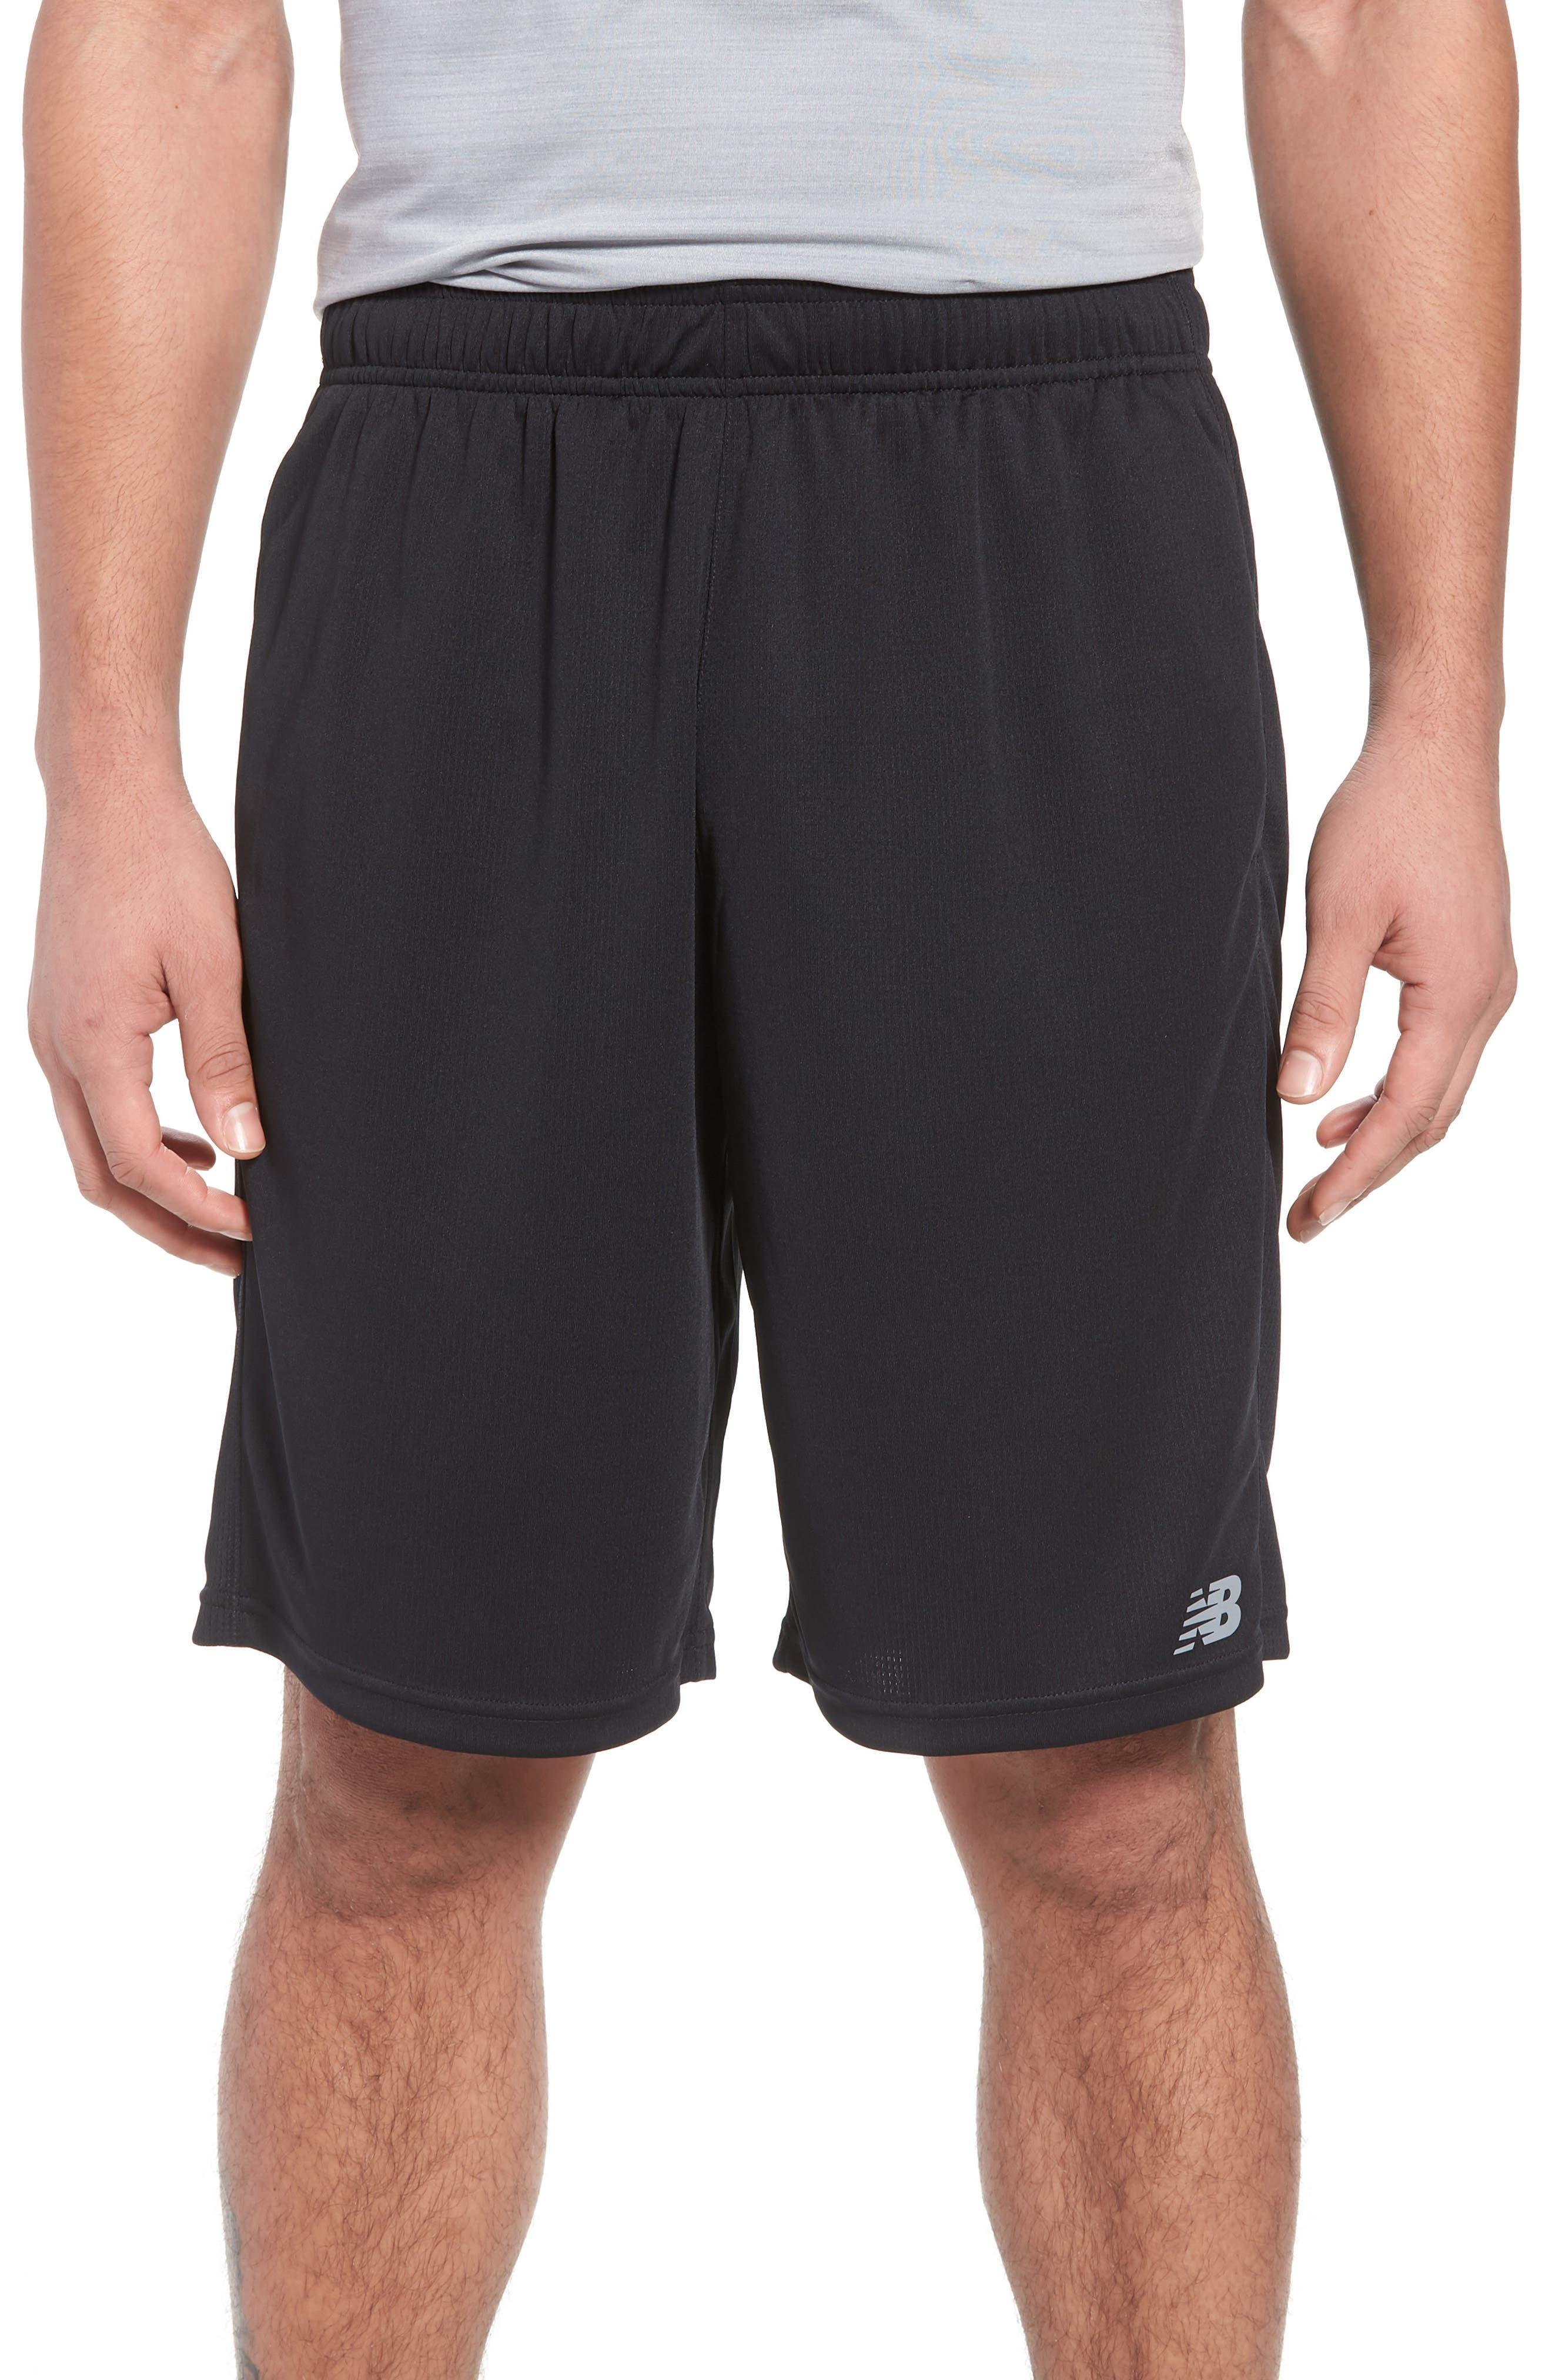 New Balance Versa Shorts, Black